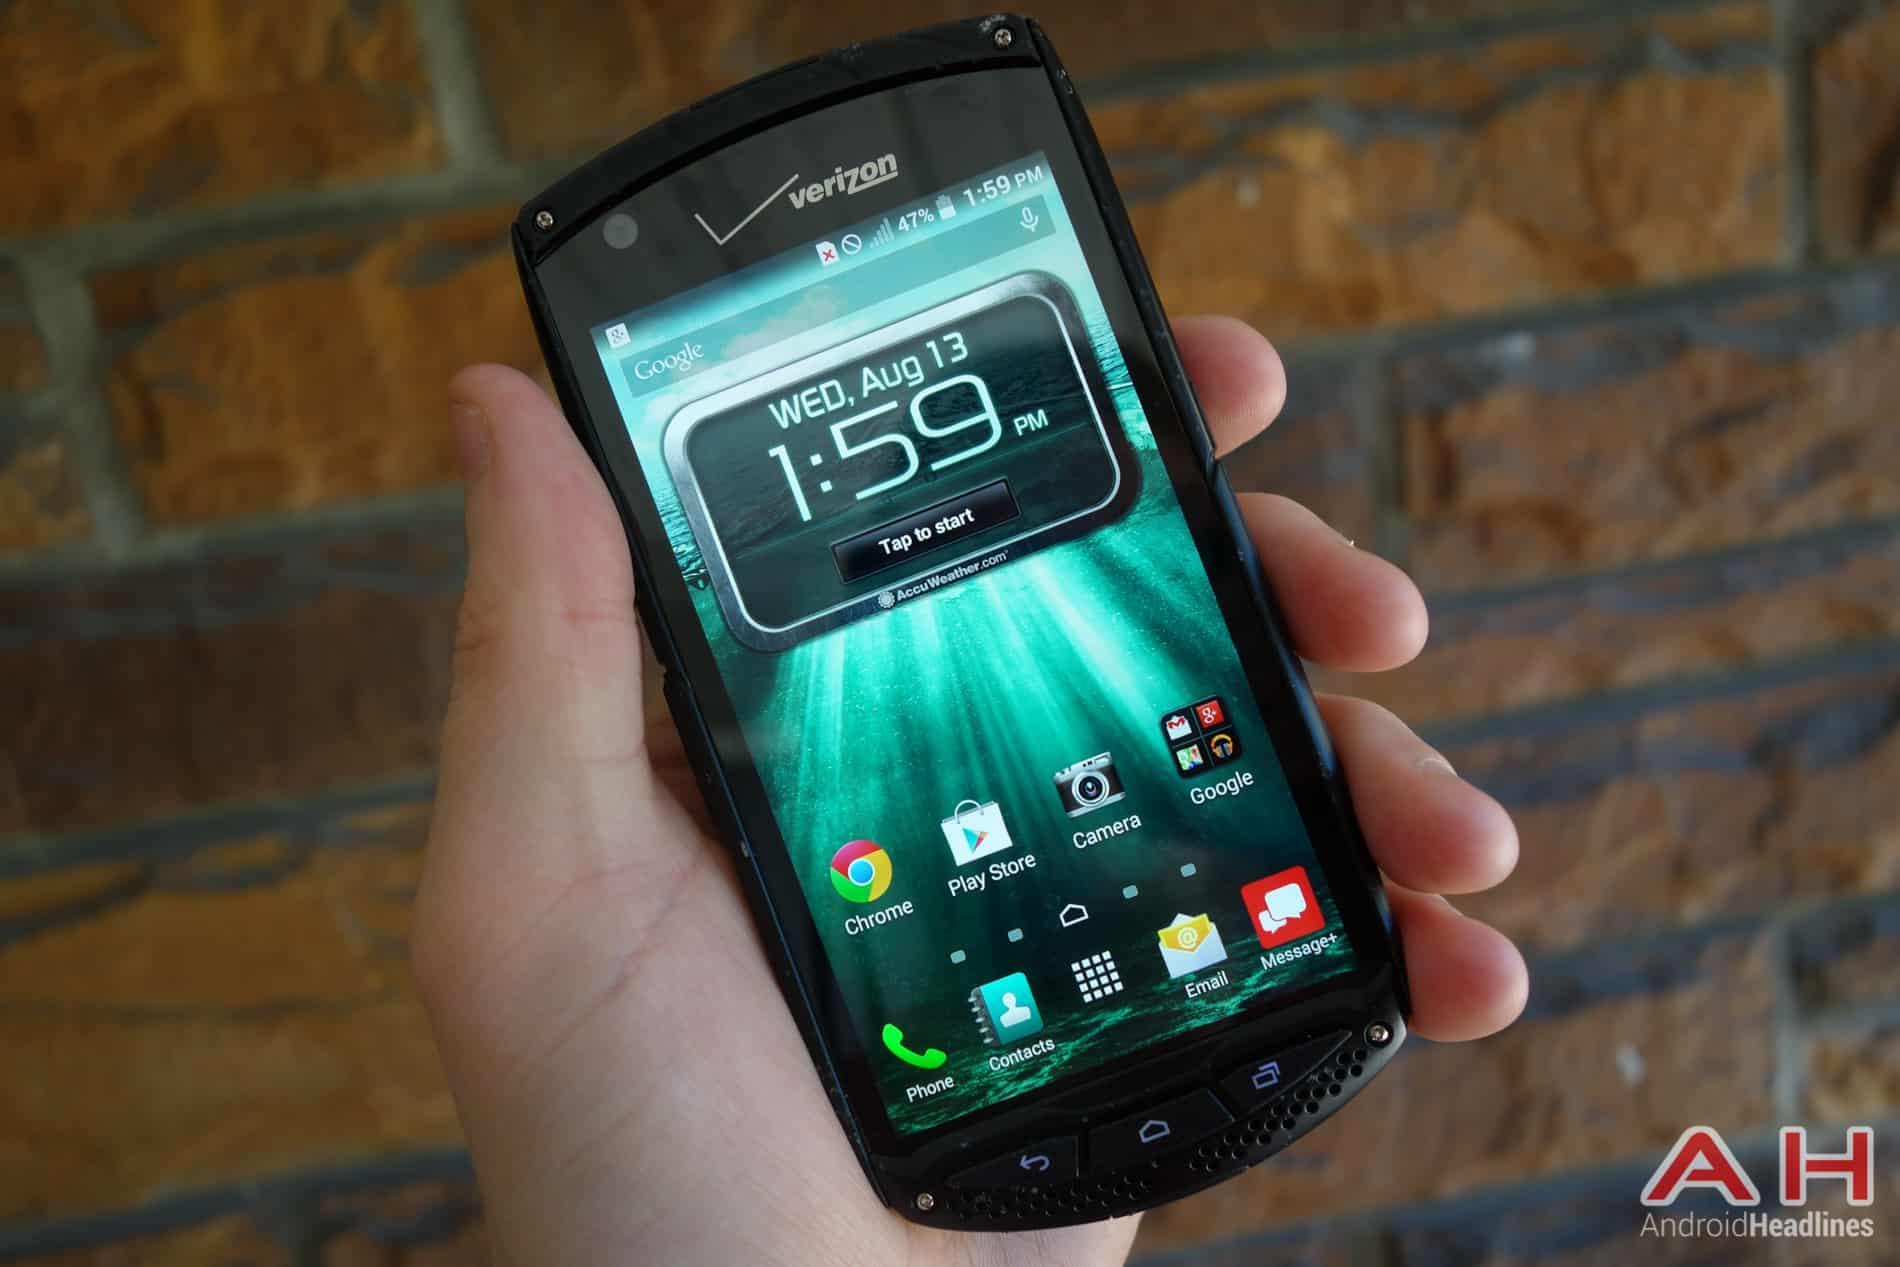 Featured Review: Kyocera Brigadier (Verizon Wireless)